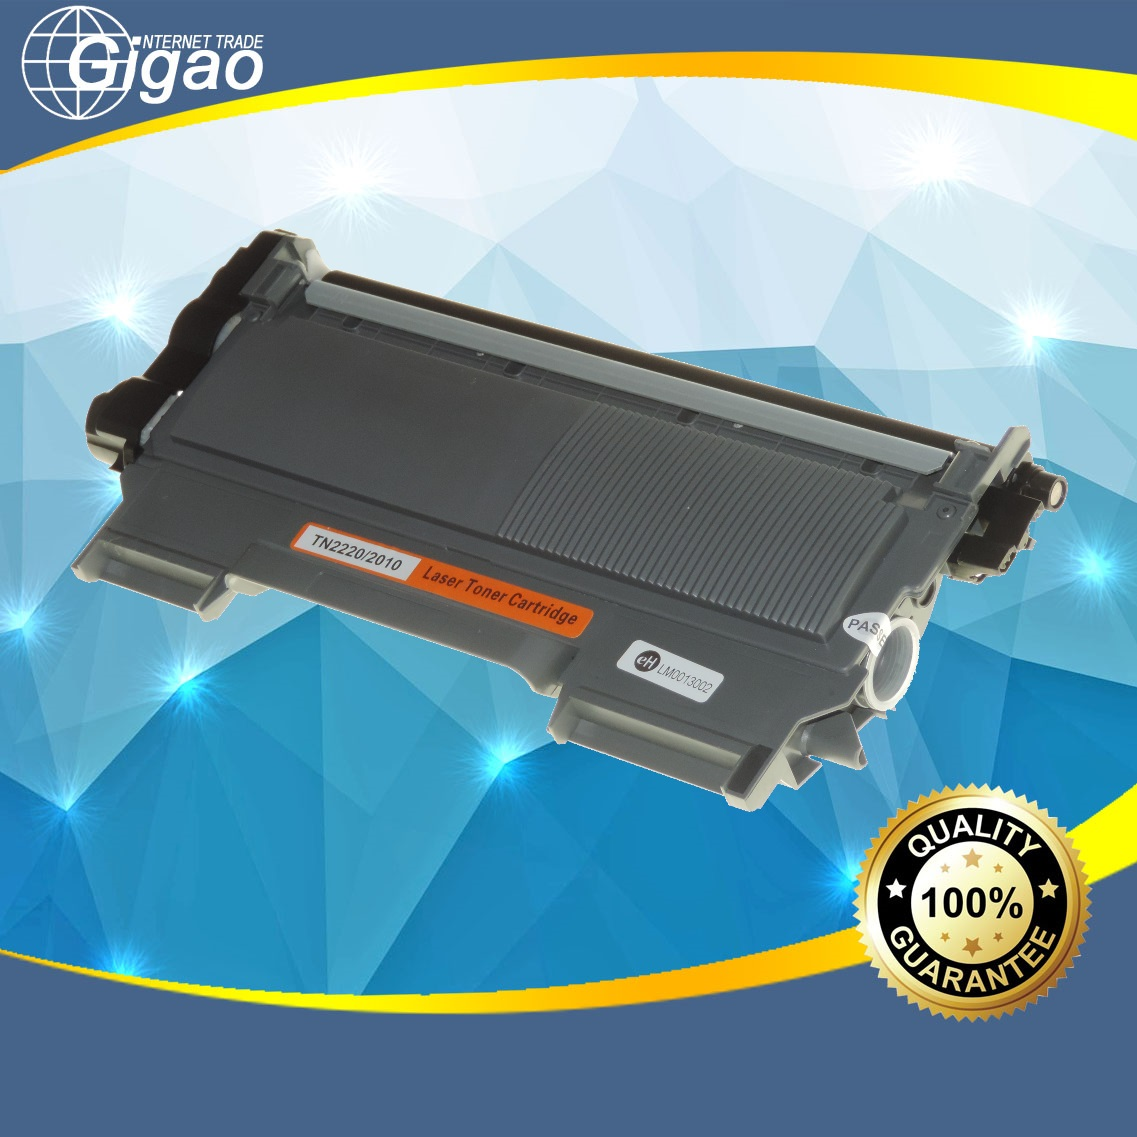 Gigao Laser Tonerkassette kompatibel Brother TN-2220 für MFC-7860DW